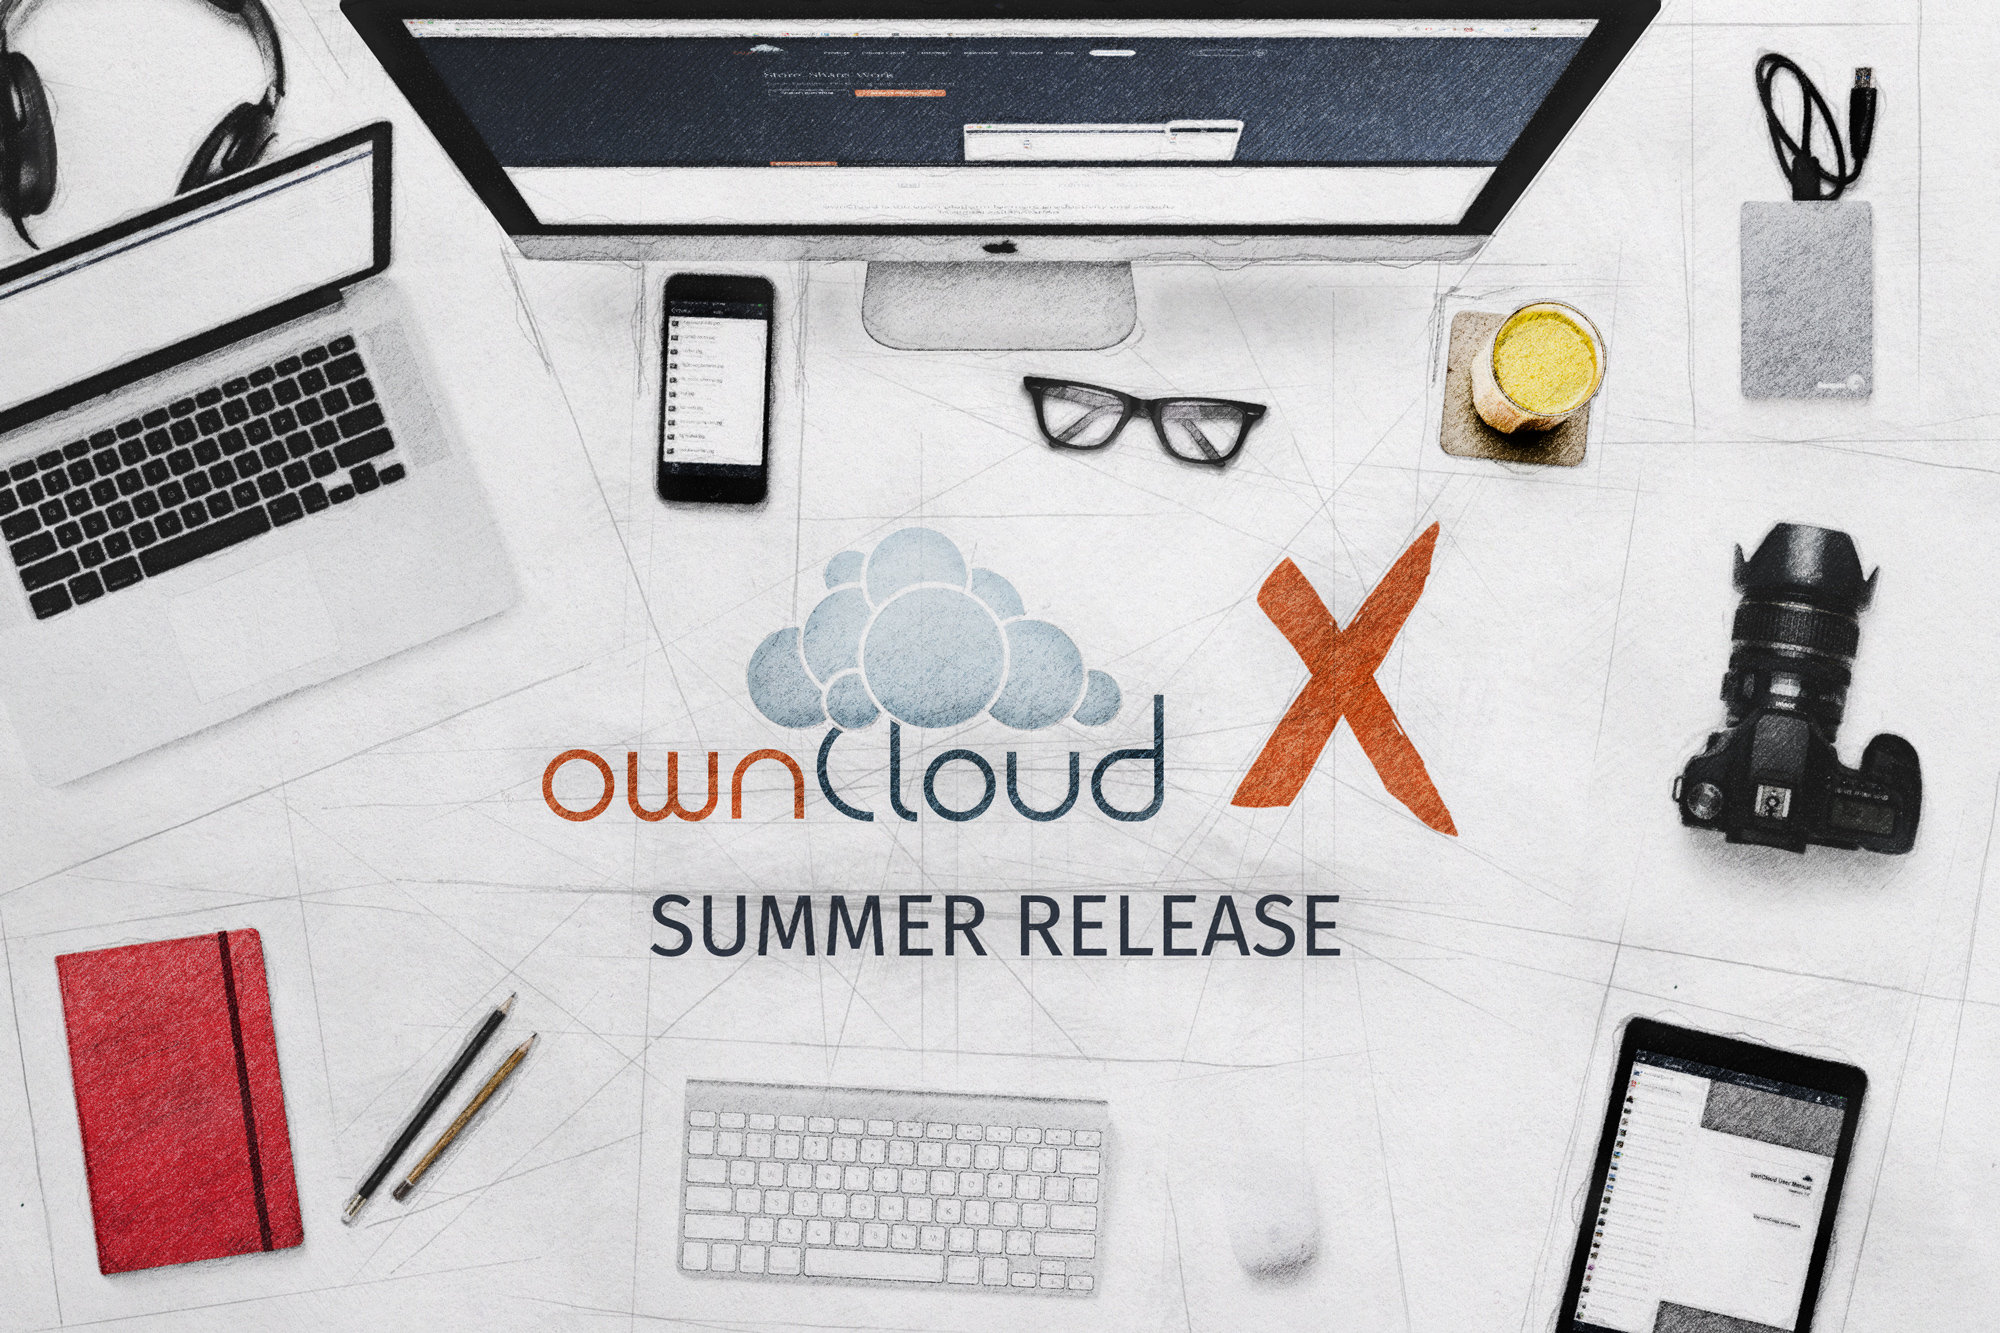 ownCloud X Summer Release 10.0.9